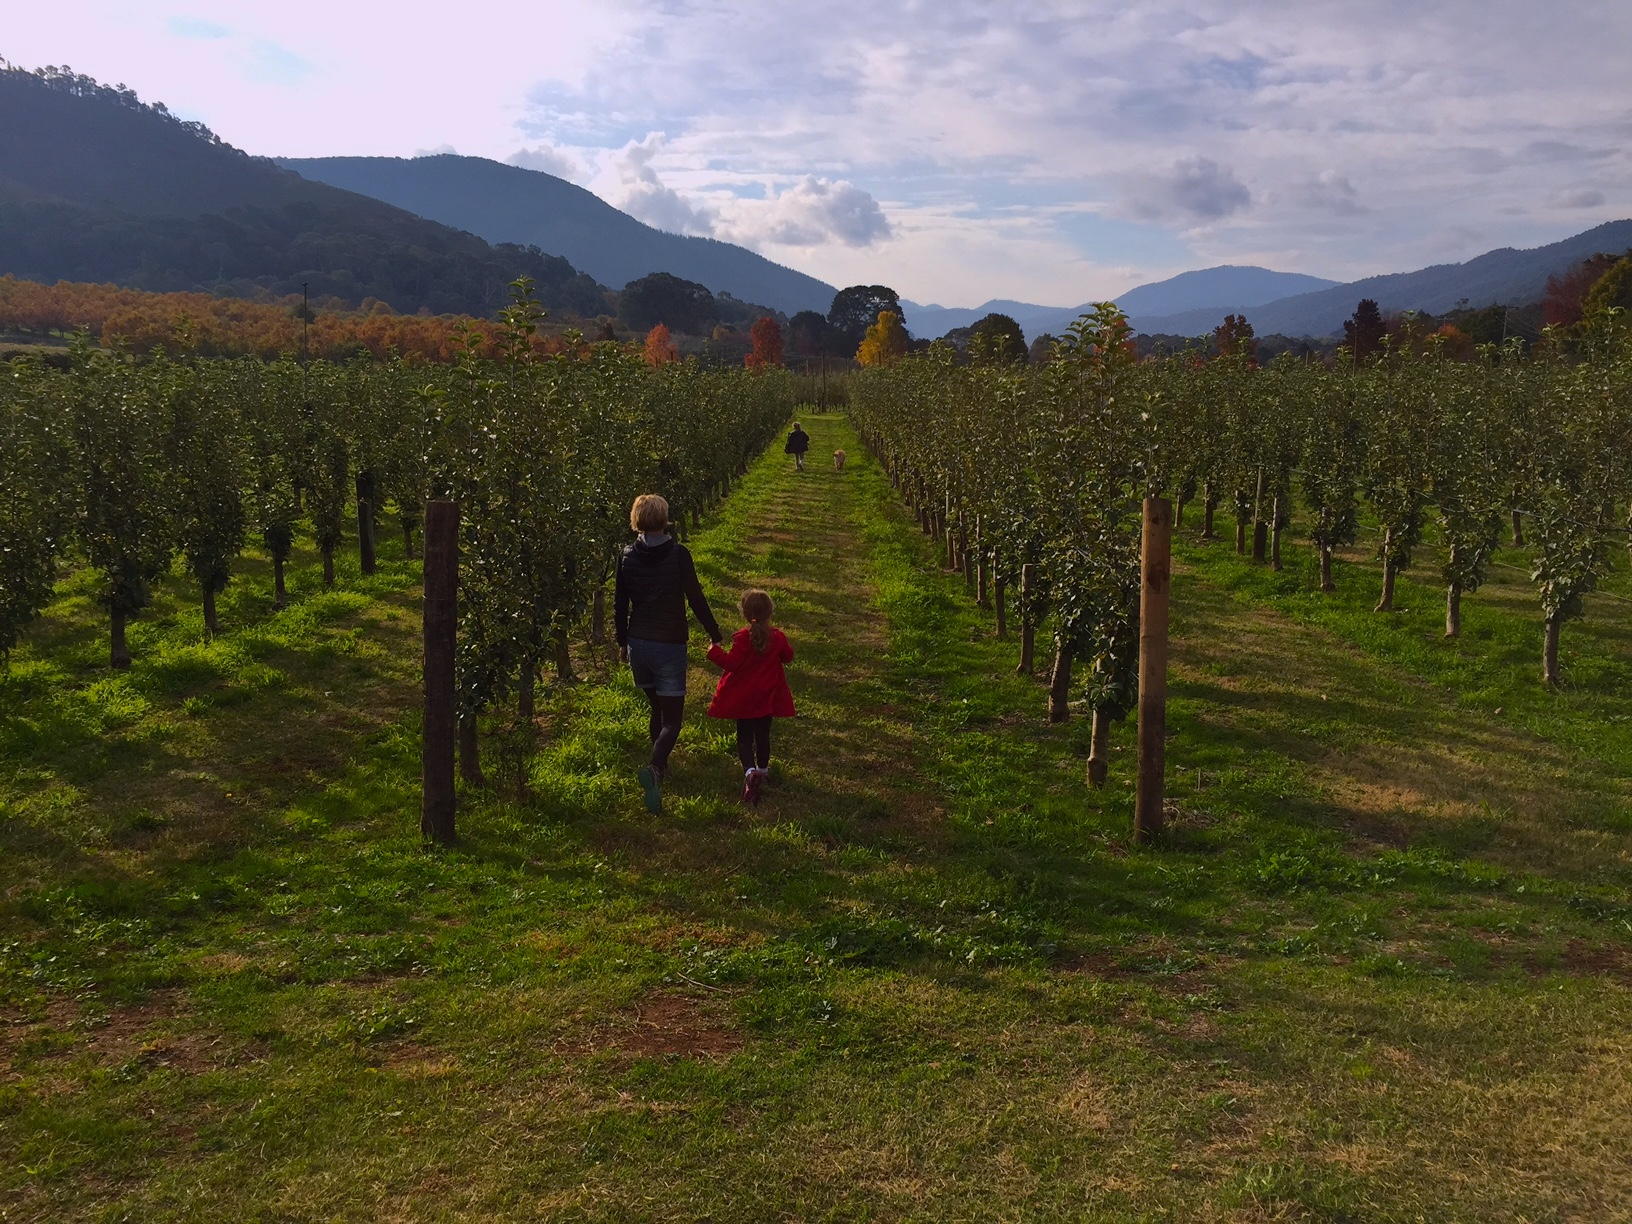 Apple orchard walks - Wandilligong